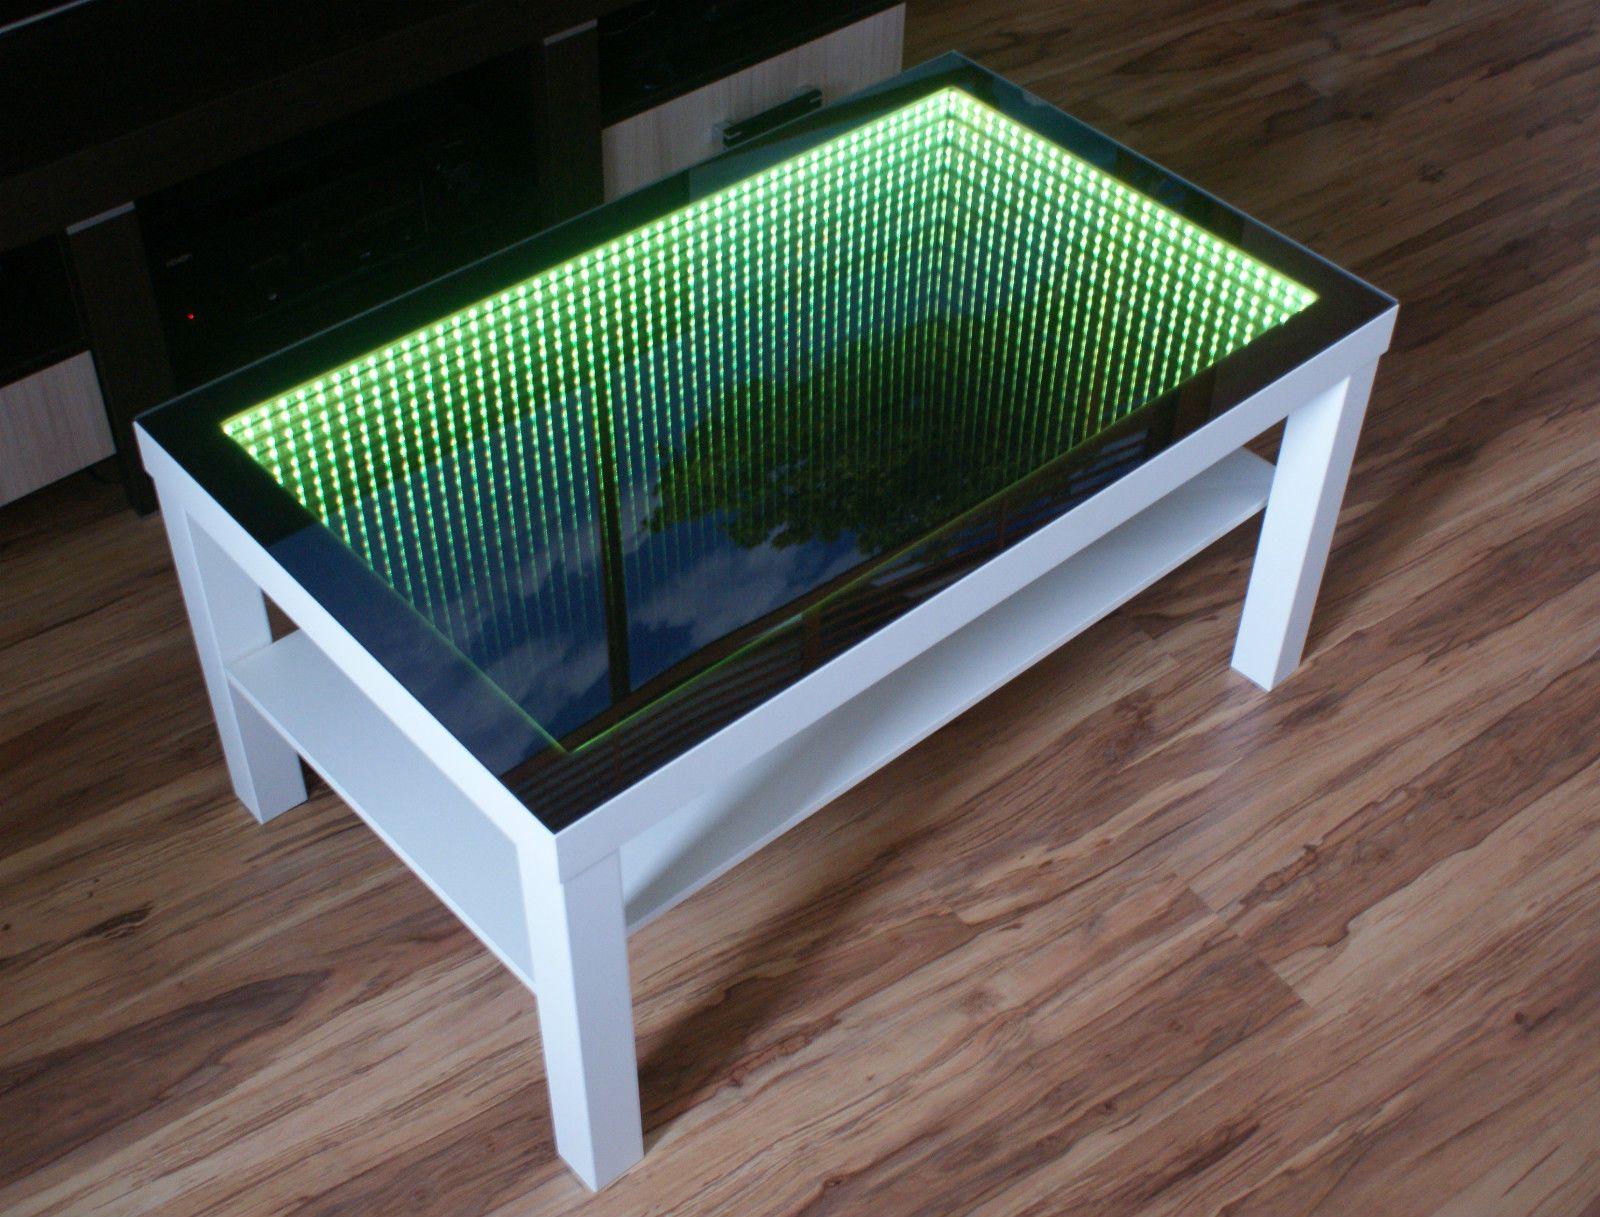 White Table Led 3d Coffee Table Illuminated Infinity Mirror Effect Remote Rf Espelho Infinito Grandes Ideias Mesa De Vidro [ 1217 x 1600 Pixel ]